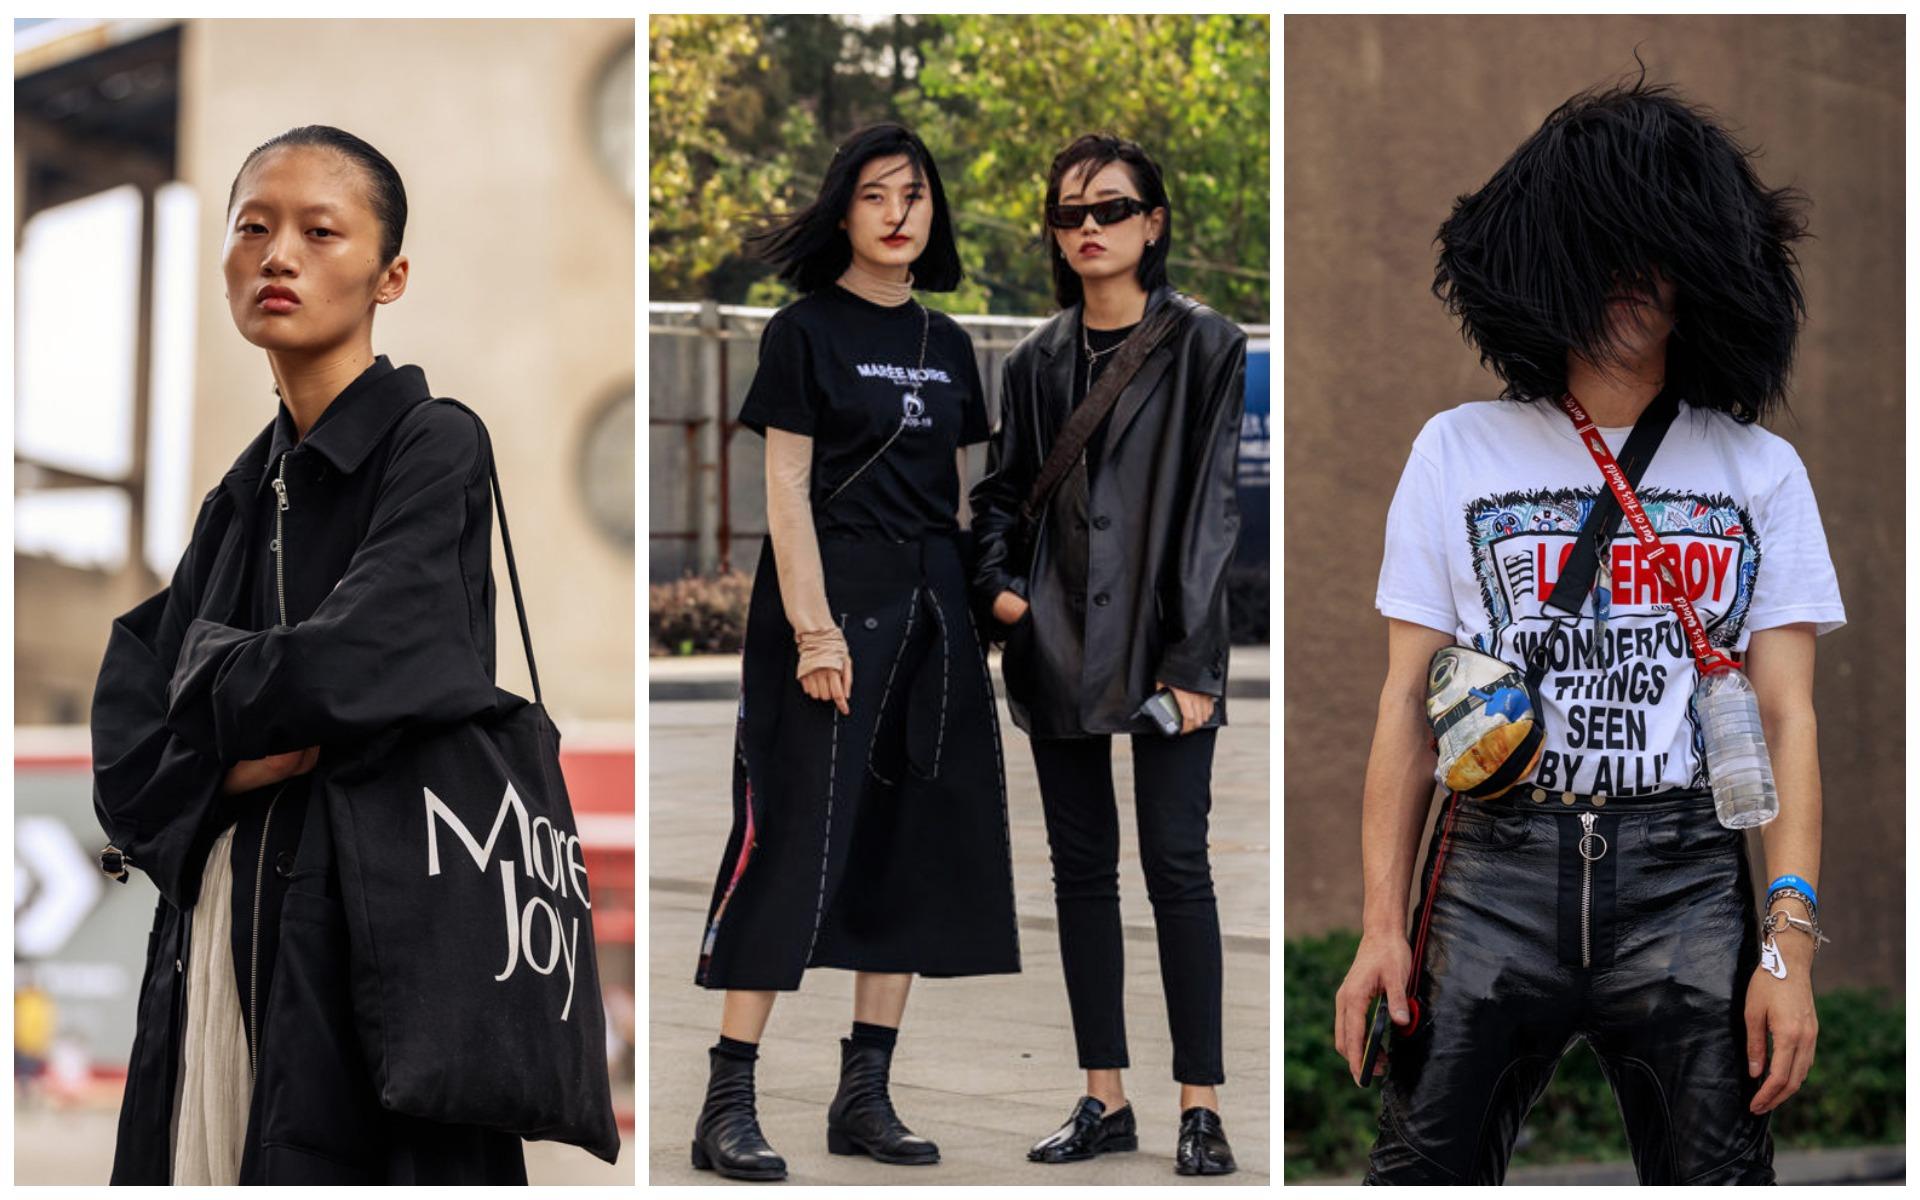 Гости Недели моды в Шанхае сезона весна-лето 2020